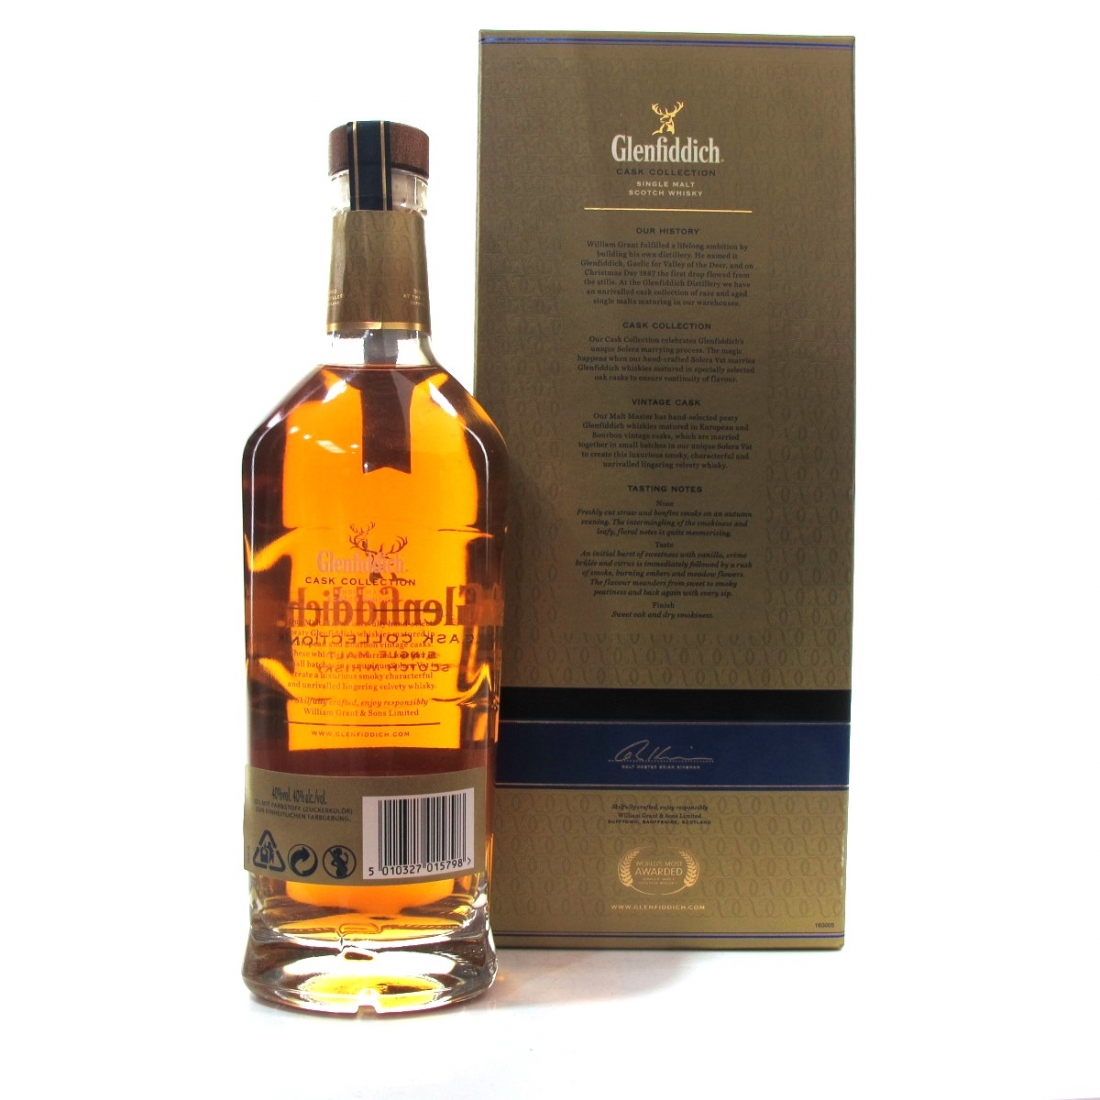 Whisky Glenfiddich Cask Collection Vintage Cask Single